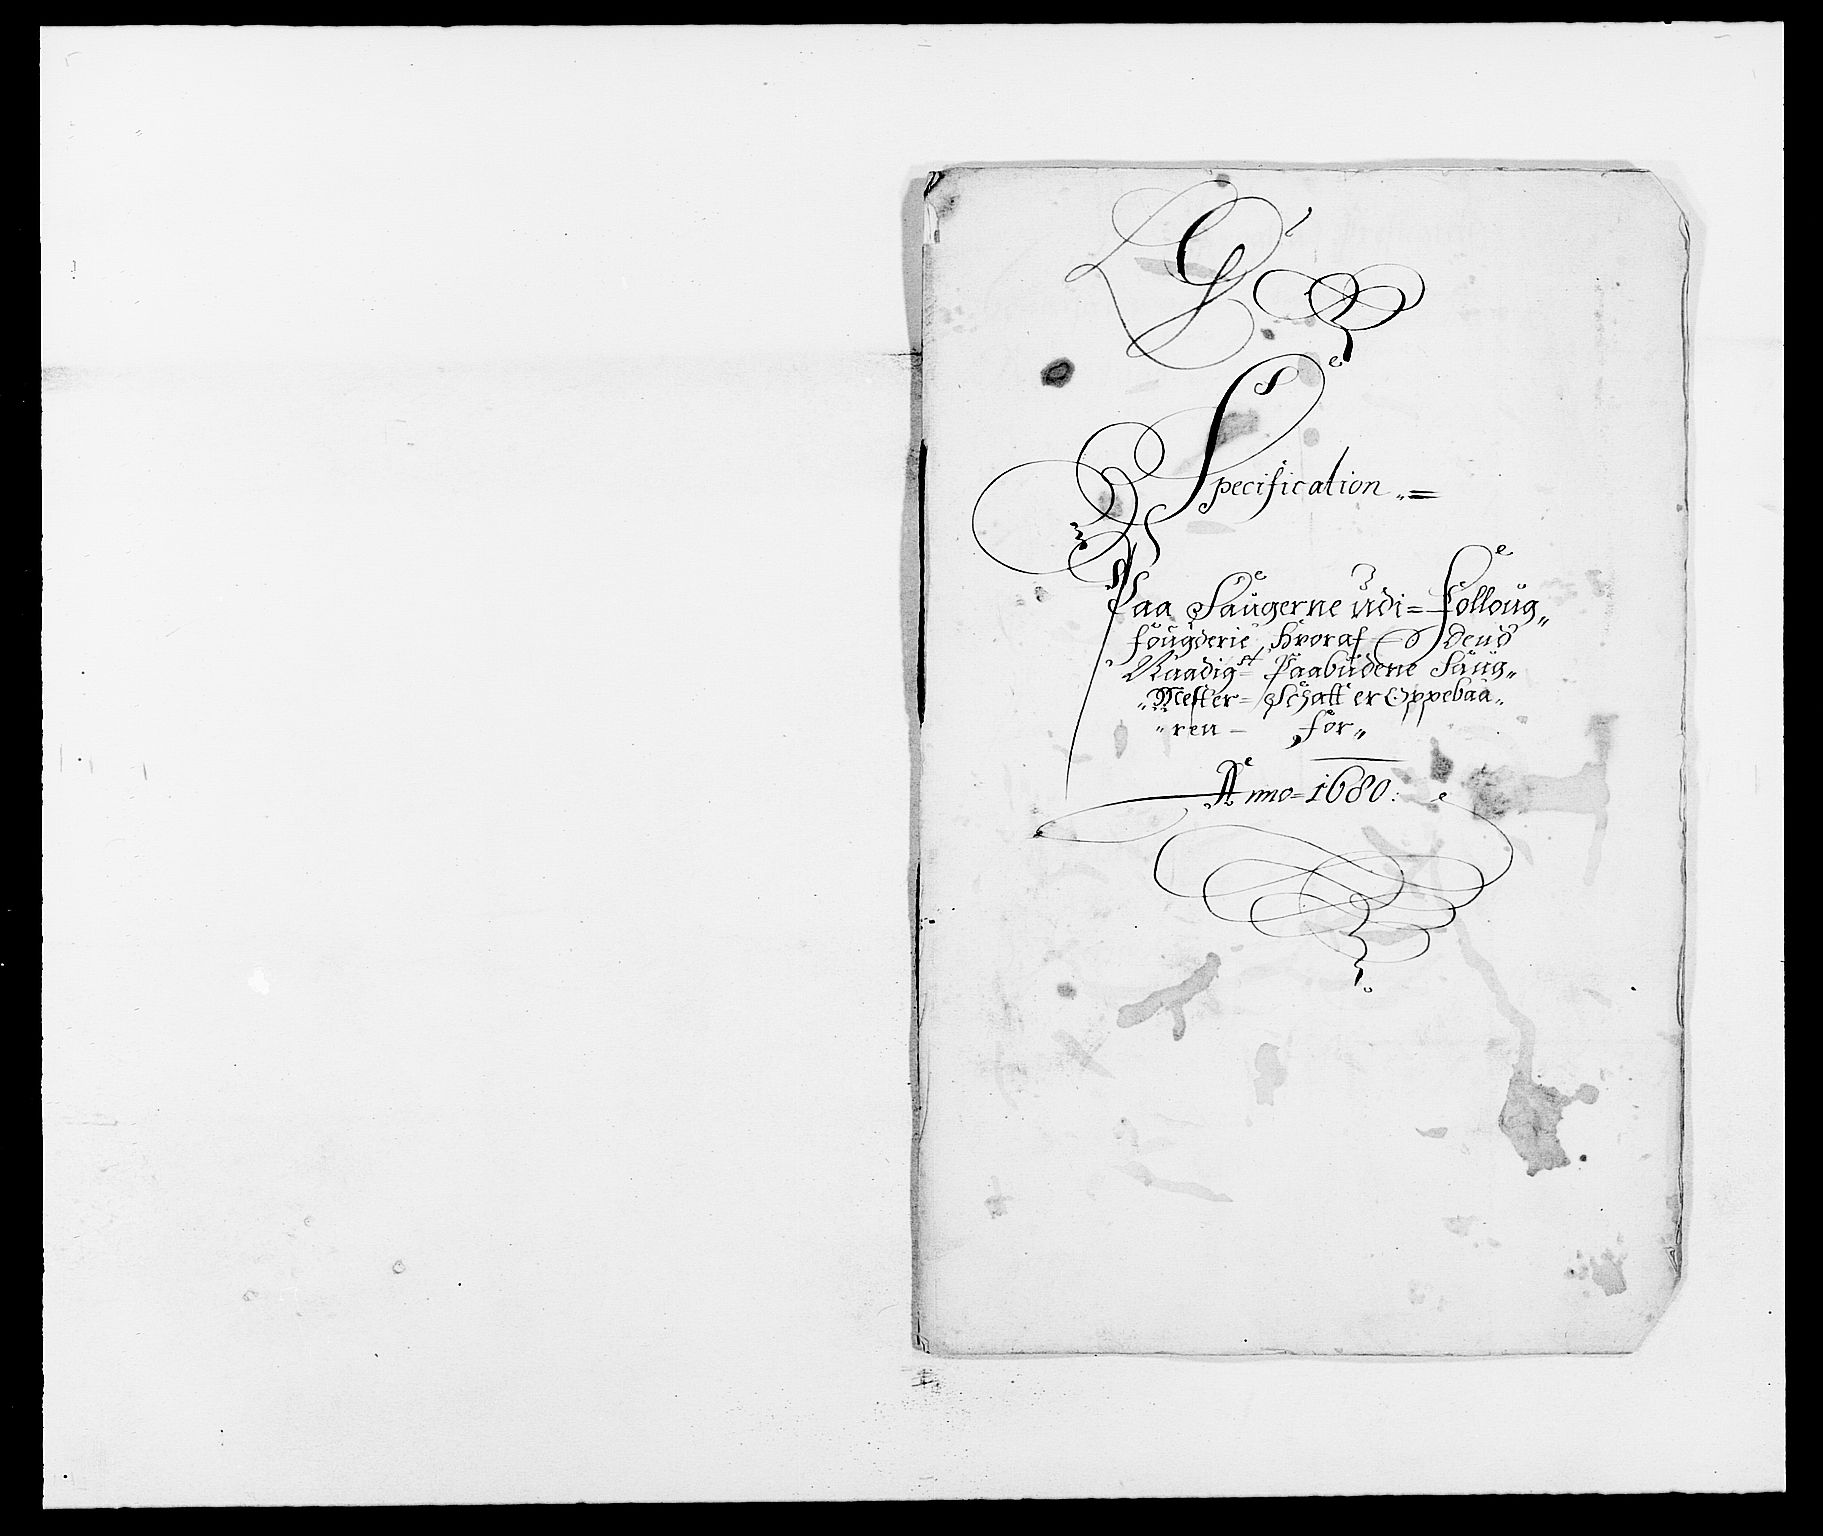 RA, Rentekammeret inntil 1814, Reviderte regnskaper, Fogderegnskap, R09/L0429: Fogderegnskap Follo, 1680-1681, s. 154